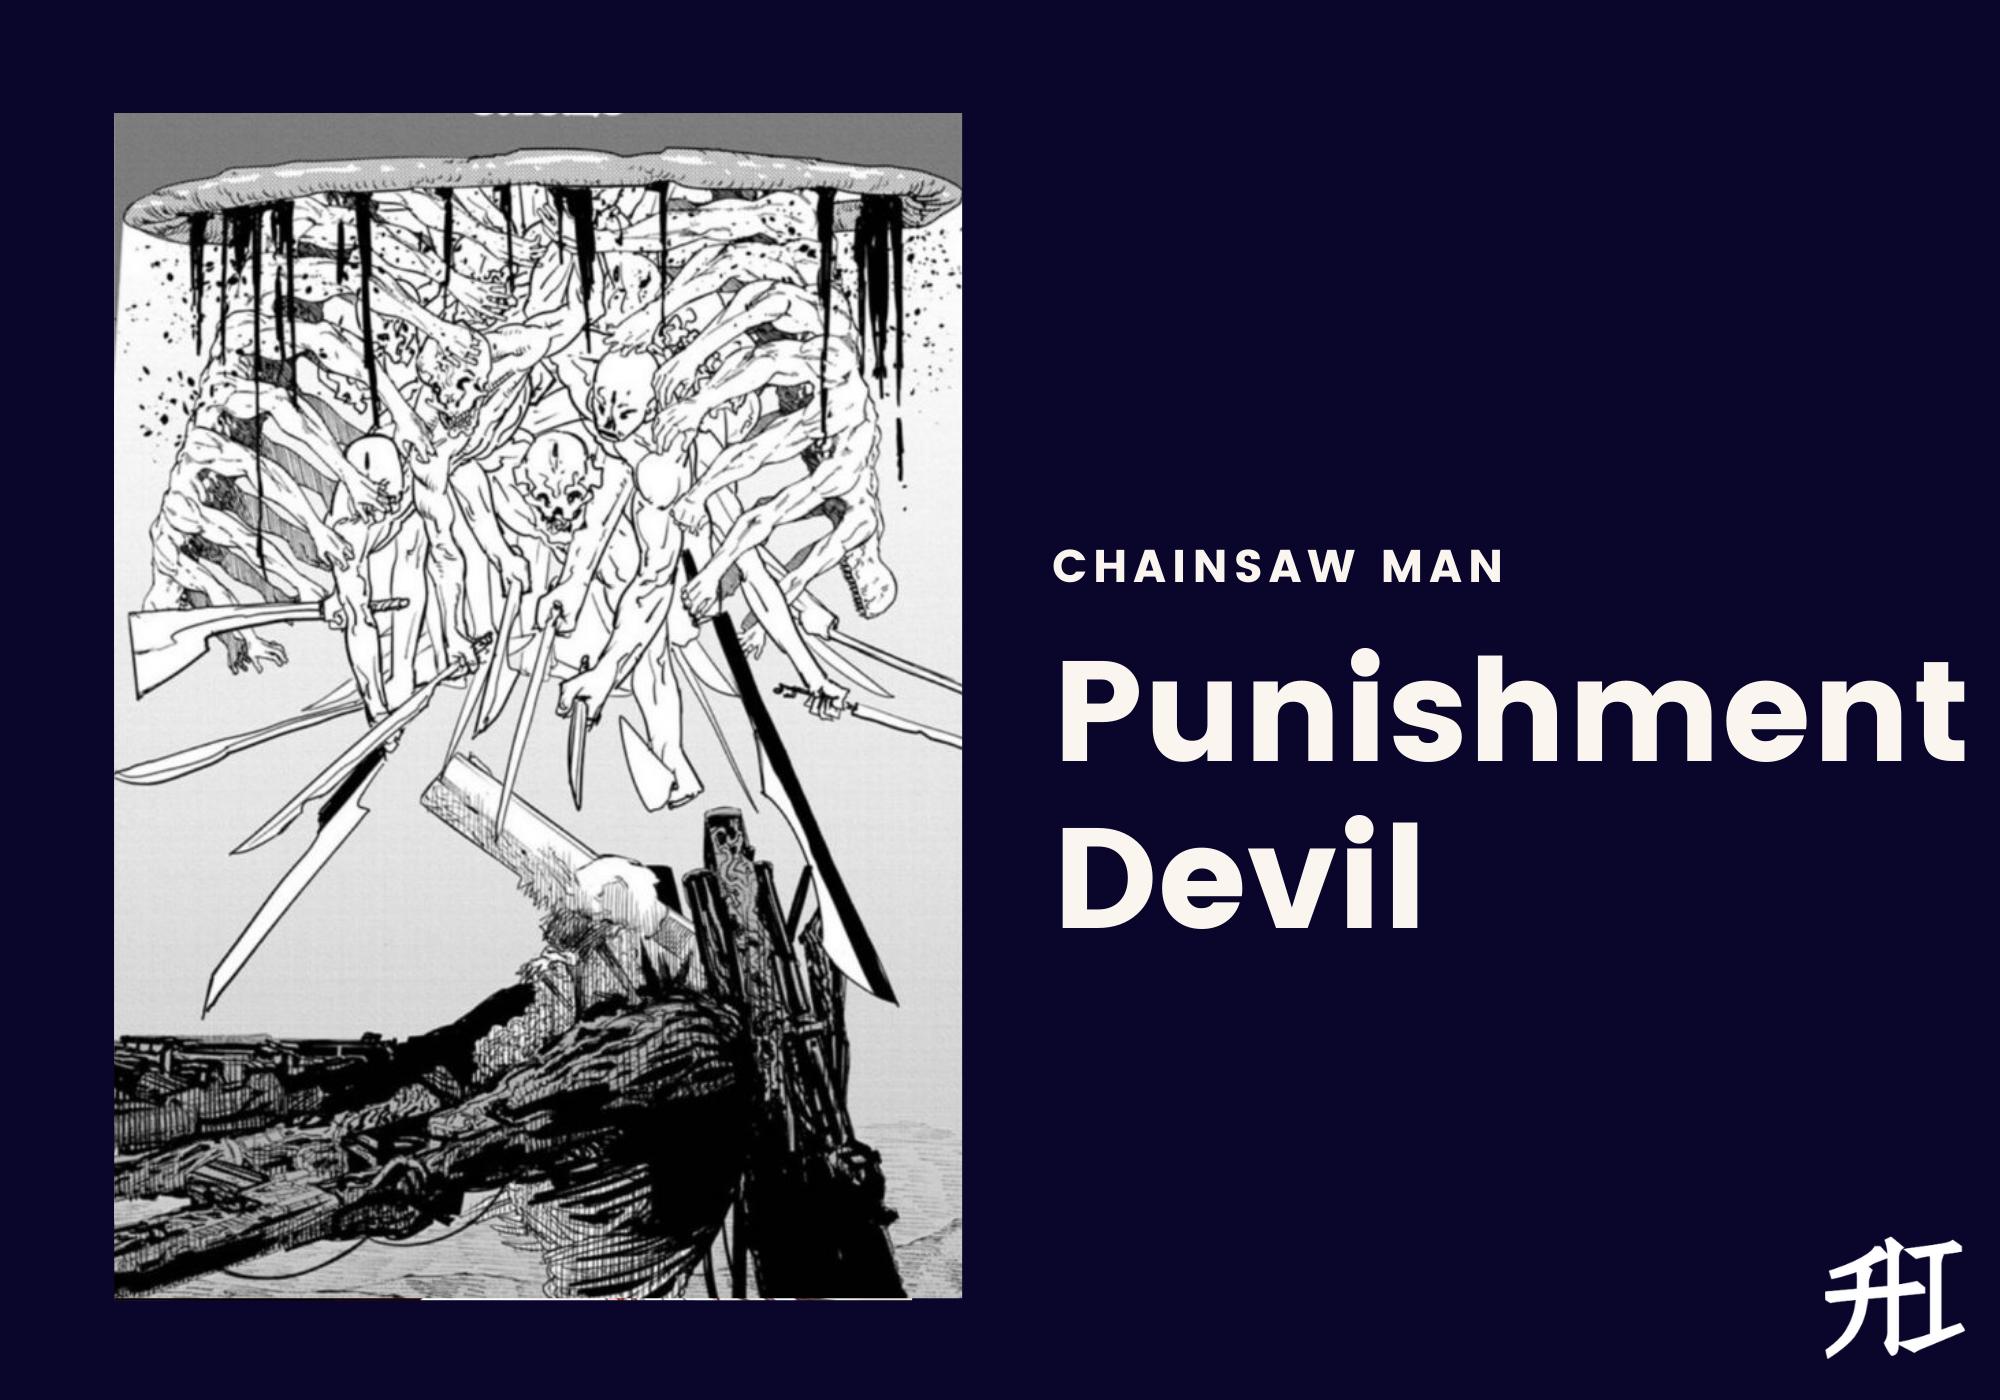 Punishment Devil -  Chainsaw Man